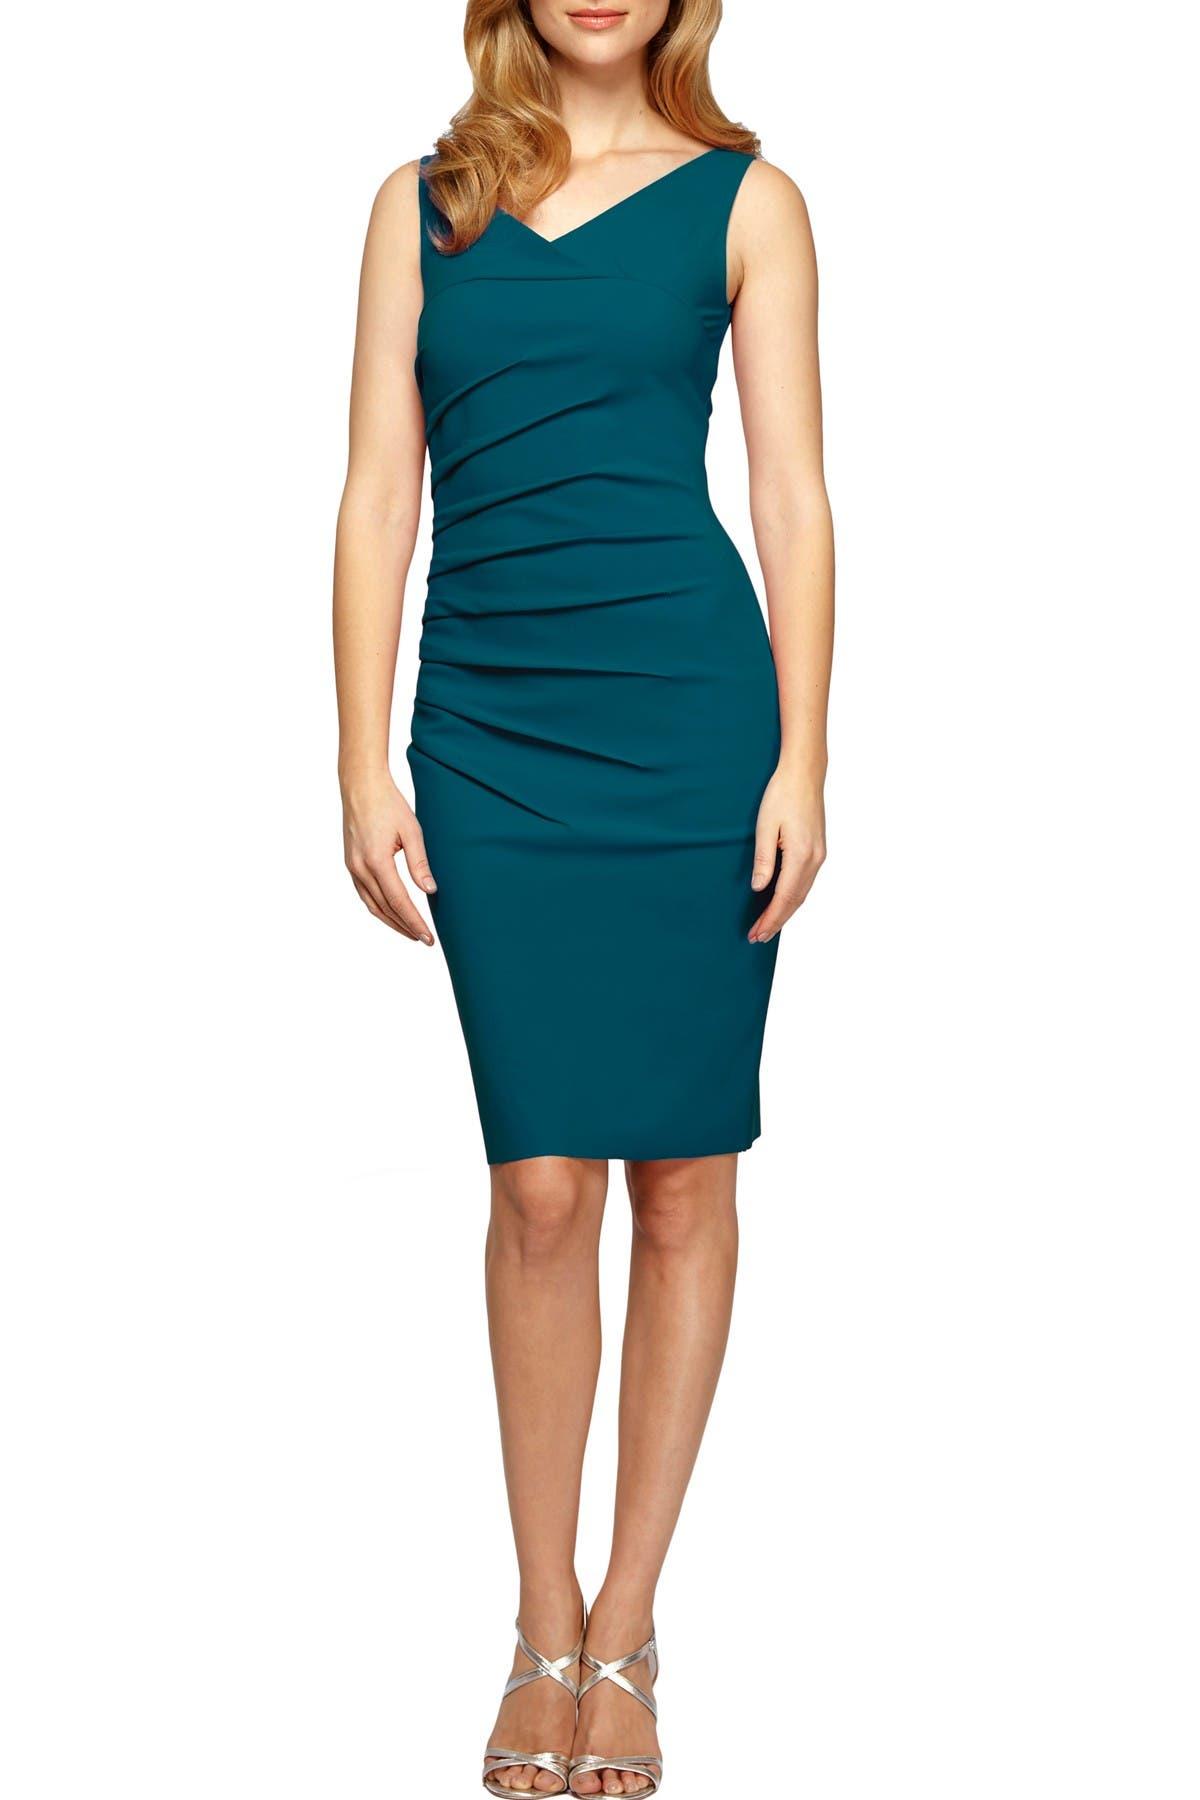 Image of Alex Evenings Starburst Tuck V-Neck Sheath Dress